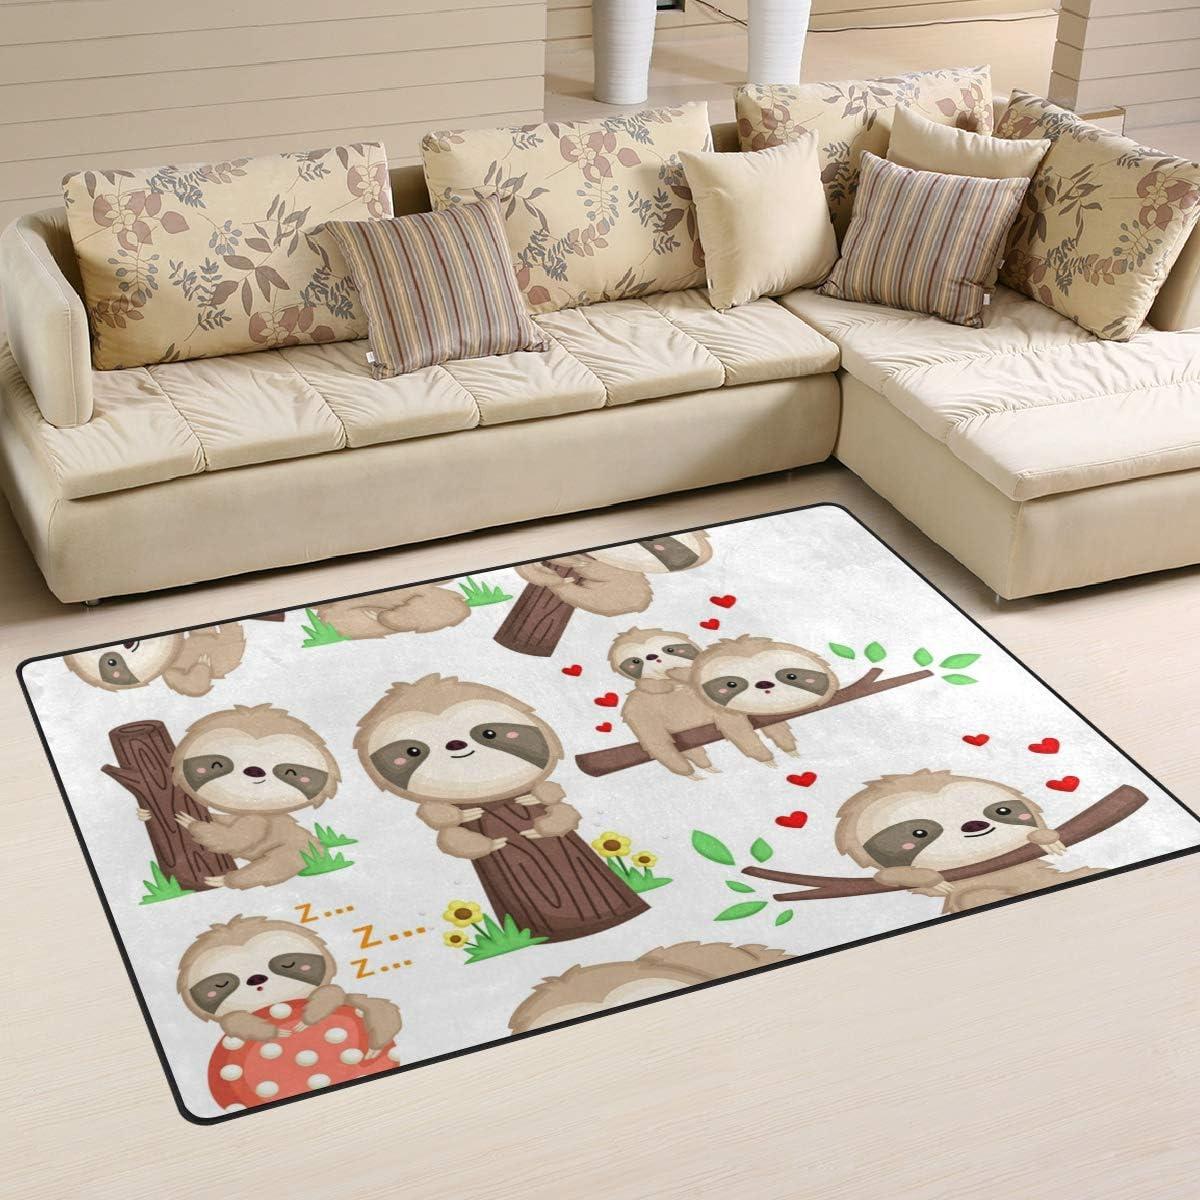 Modern Area Rugs 3x5 Washable - Nursery Cute Aera 新作販売 Rug Soft Sloth 買い物